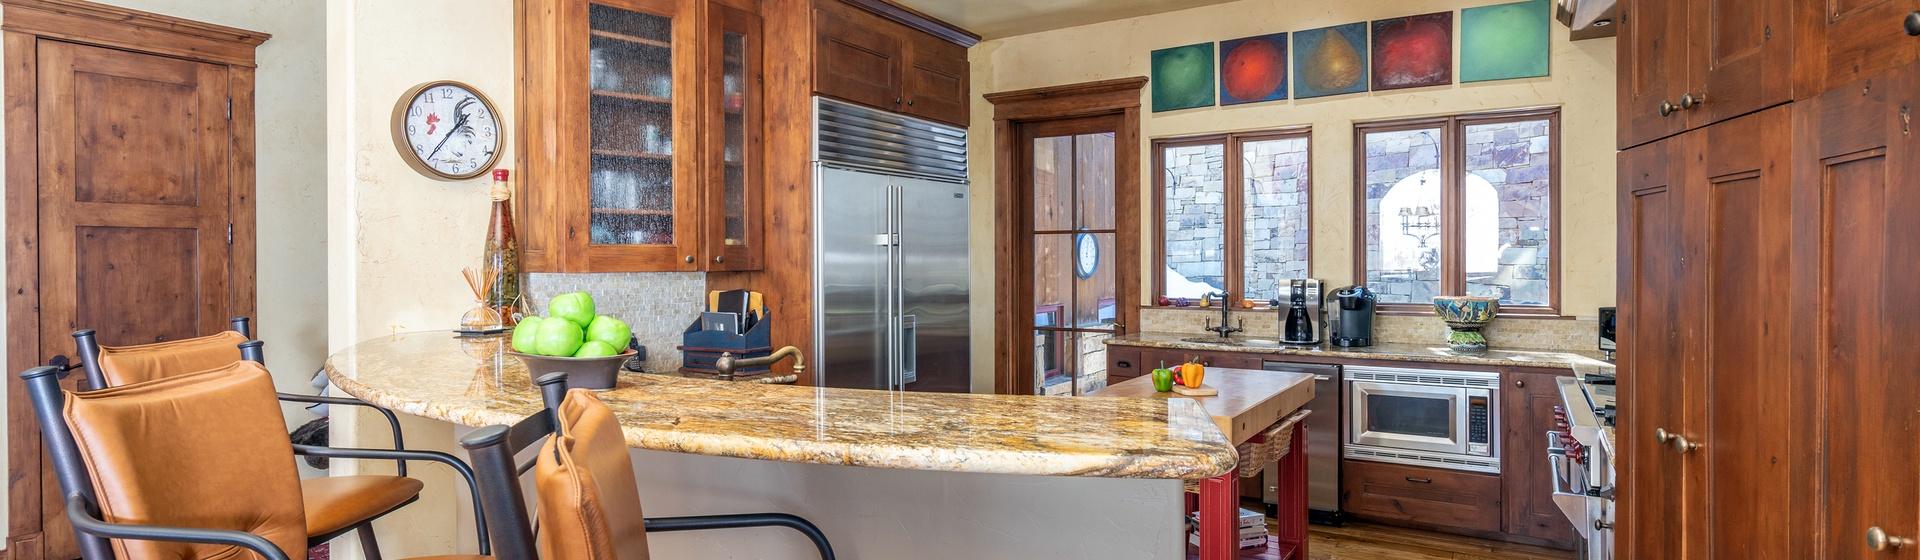 5-Telluride-Stonegate-Kitchen-Bar-Web.jpg